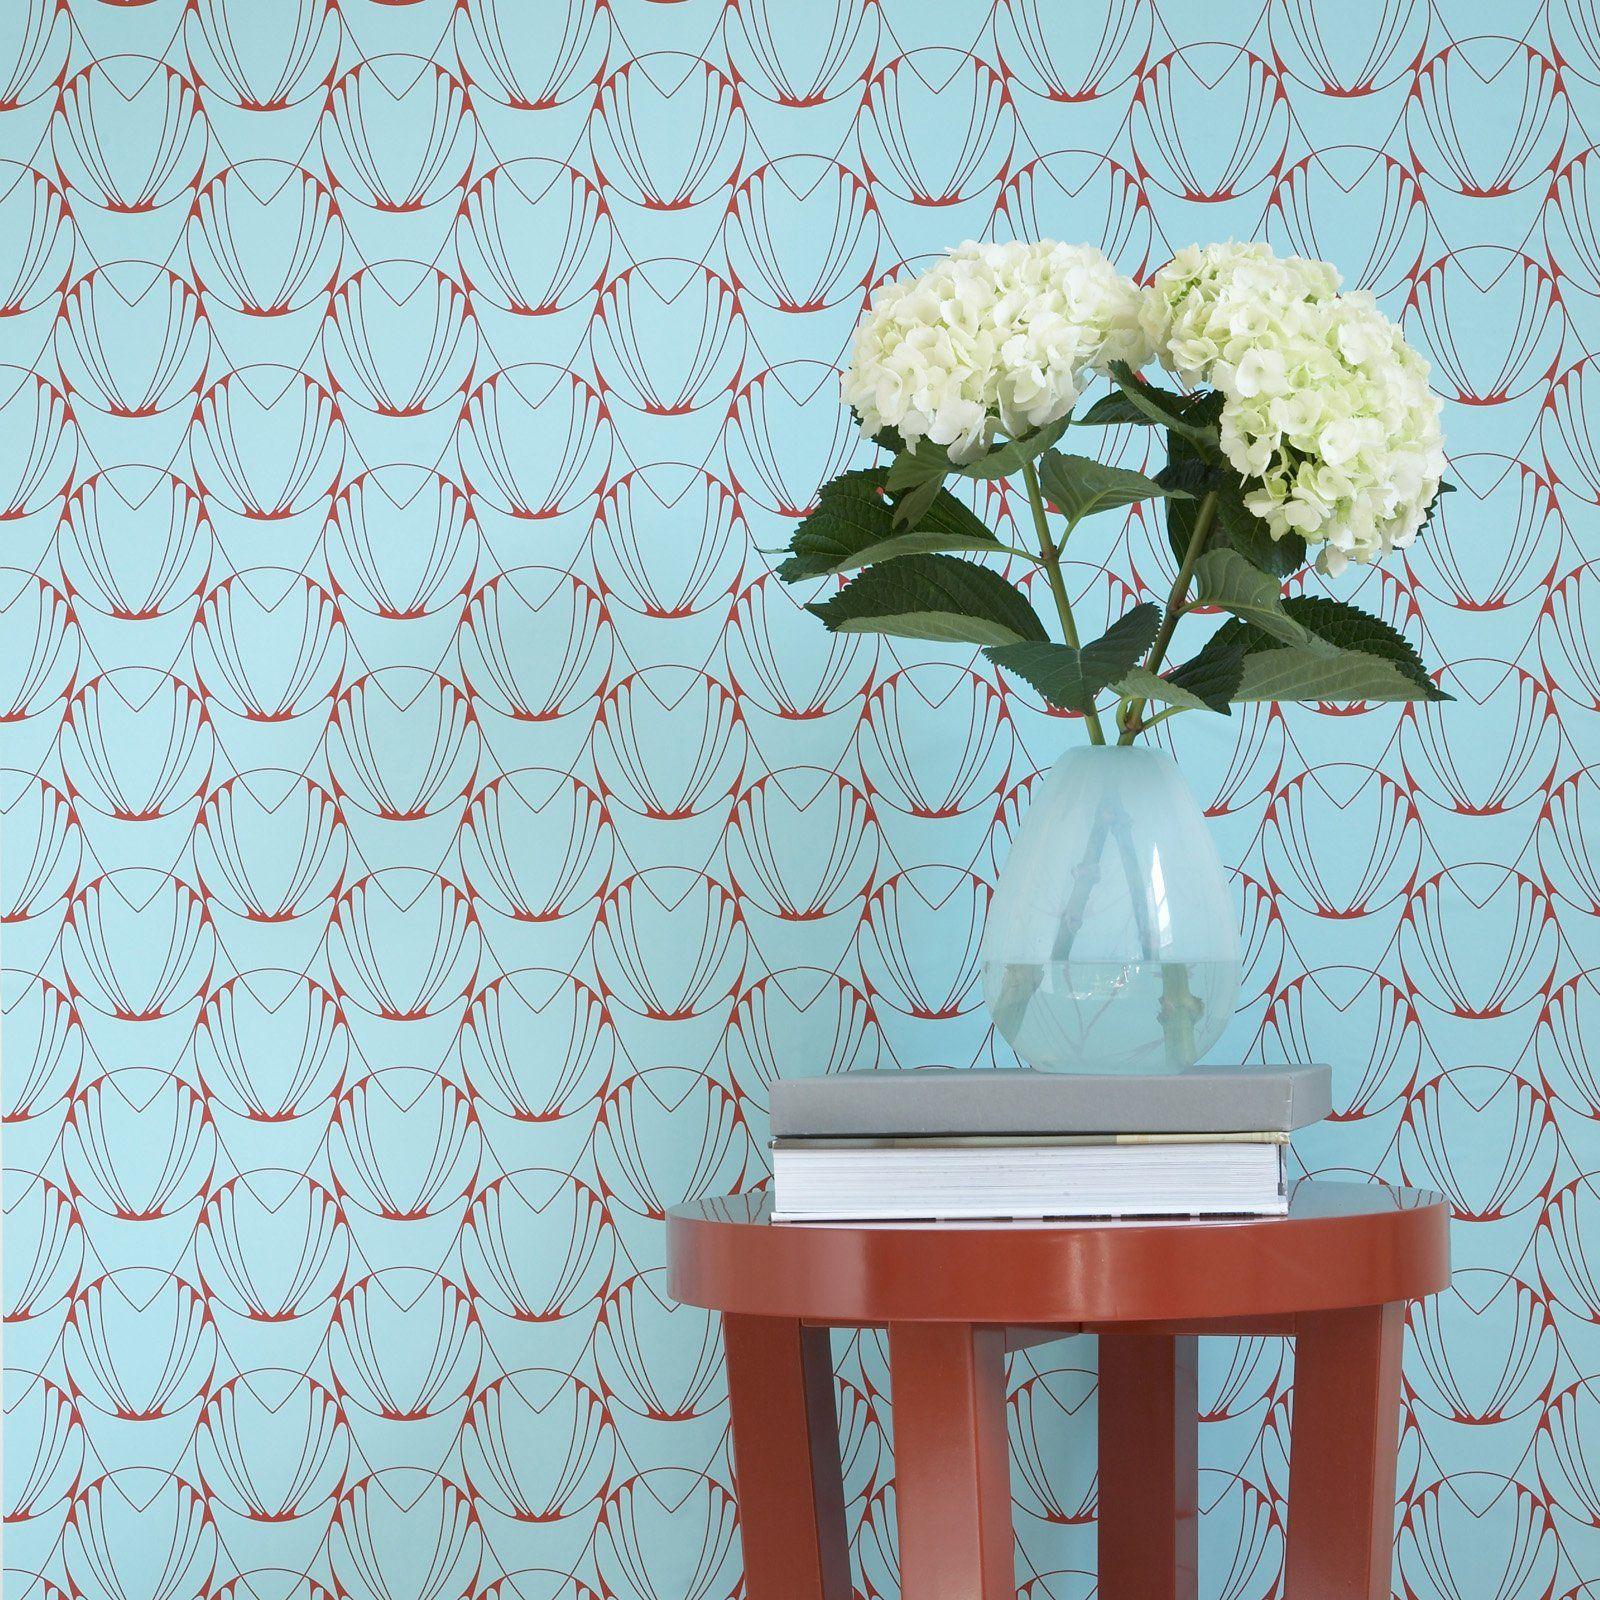 Alto Repositionable Self Adhesive Wallpaper - Caribbean | Shop at the Foundary